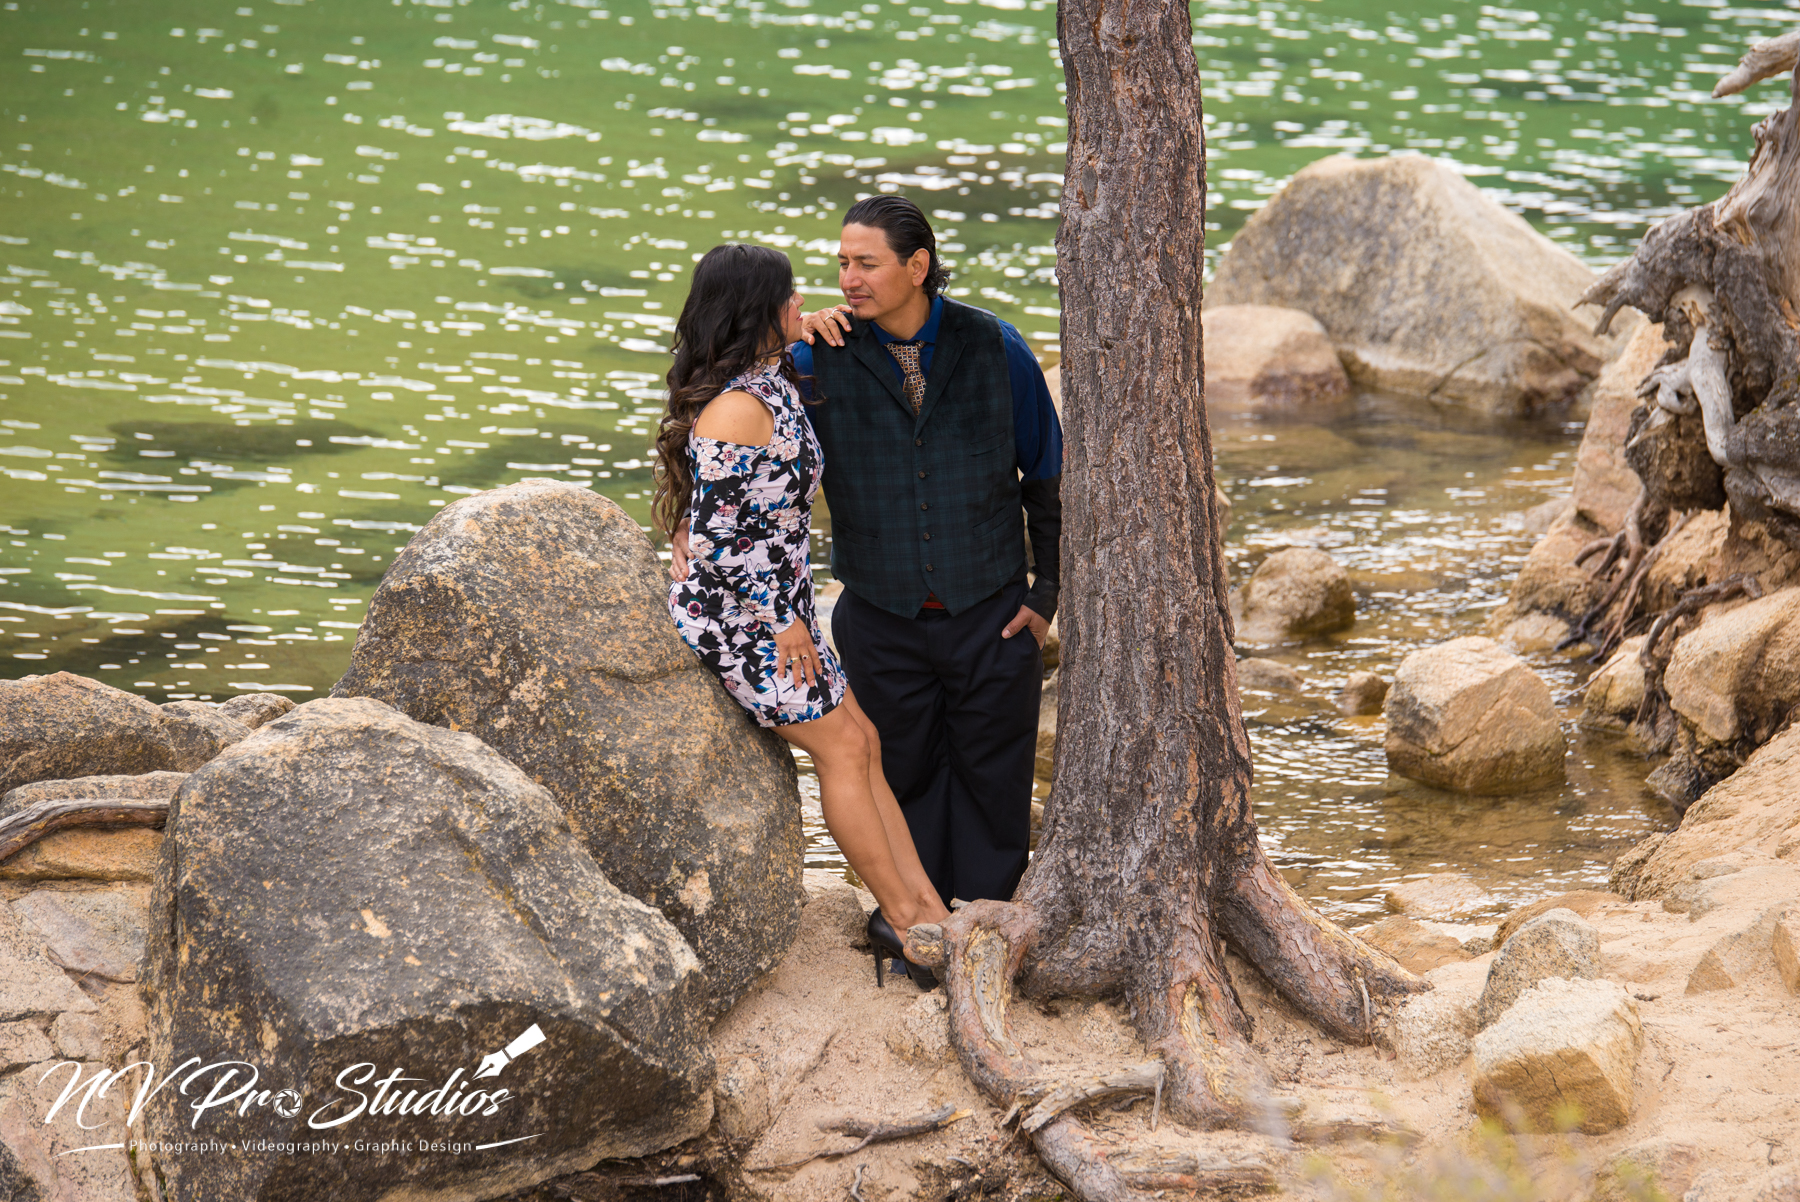 J & D - Tahoe Photography-10.jpg